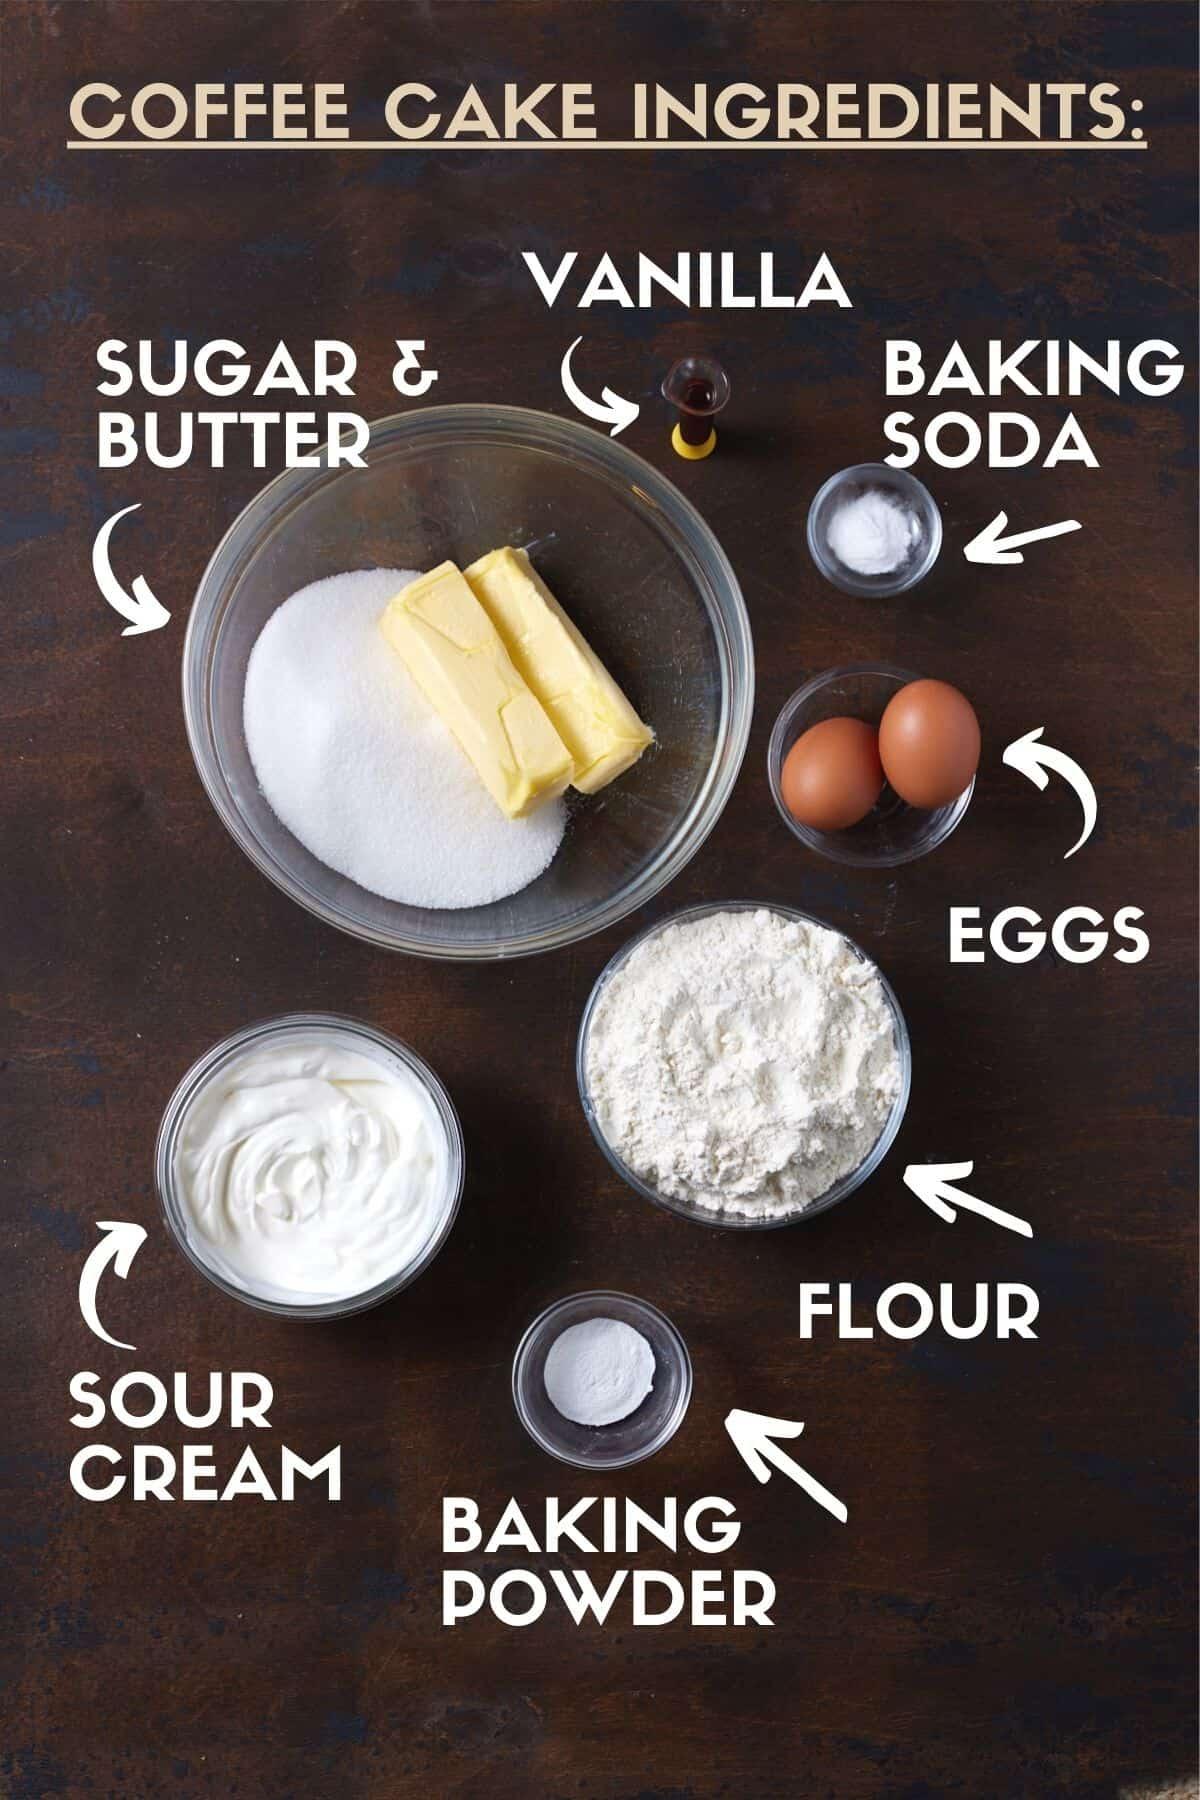 Sour Cream Coffee Cake ingredients, including butter, sour cream, sugar, eggs & flour.